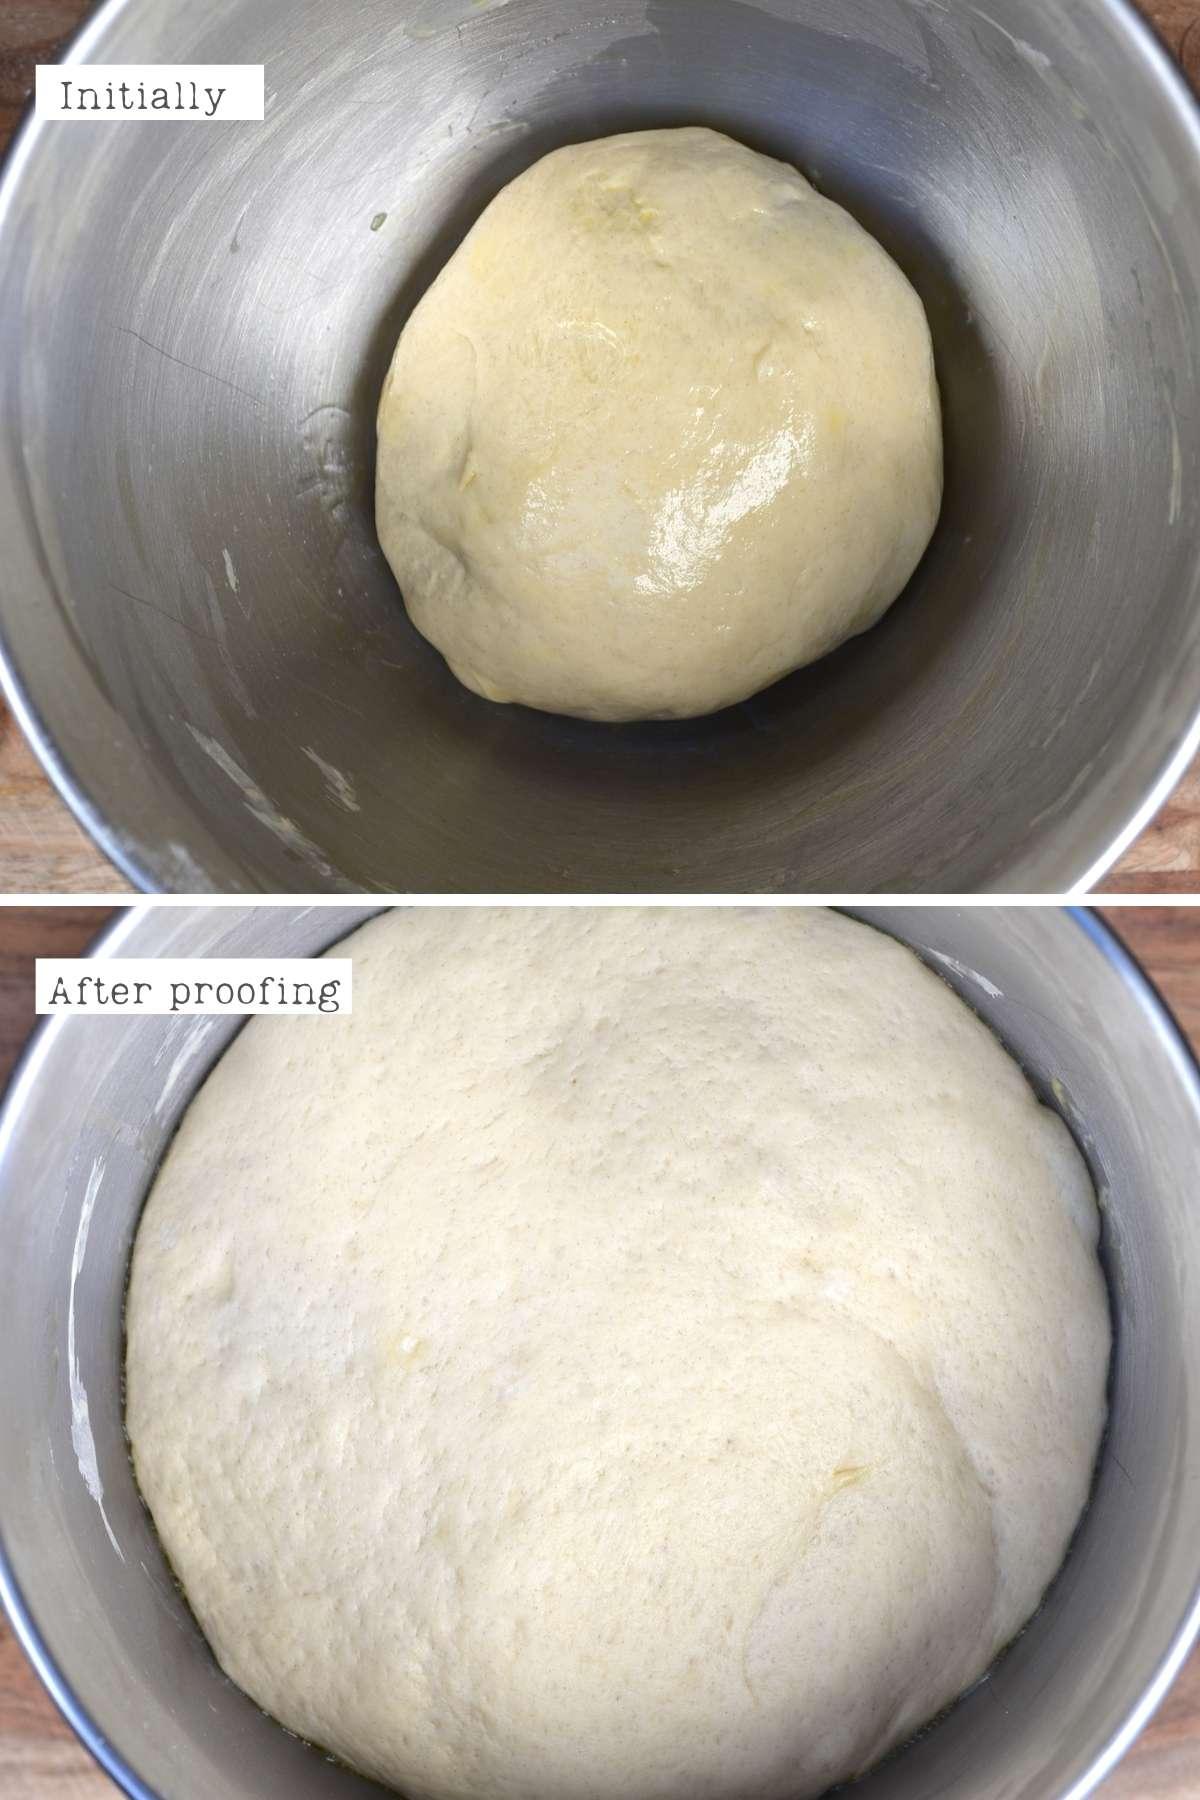 Proofing manakish dough